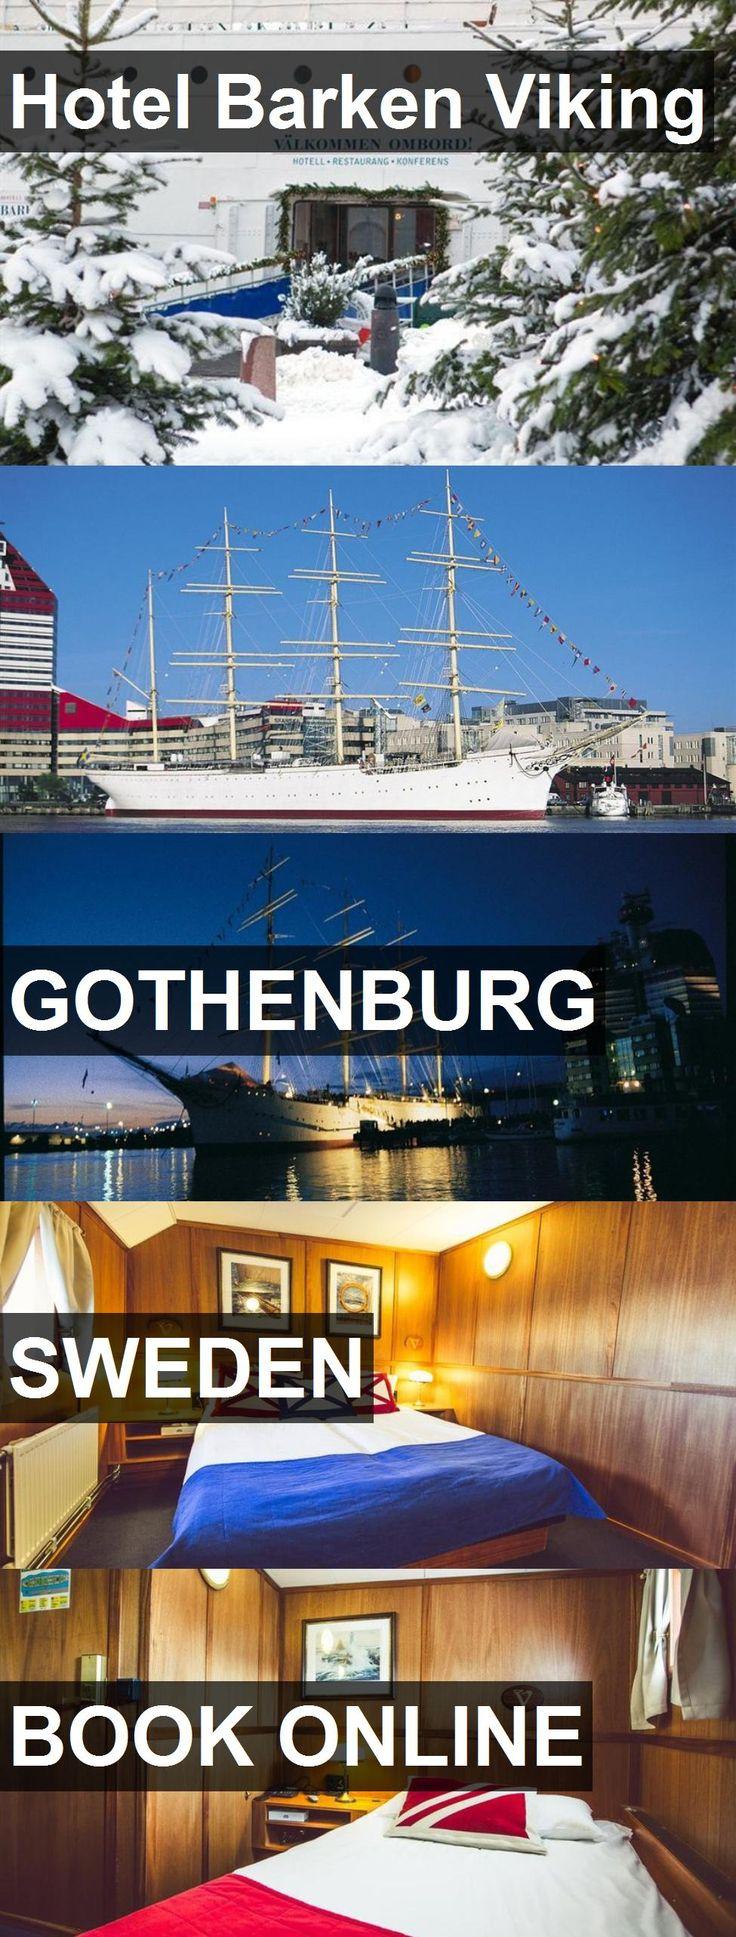 Hotel Barken Viking in Gothenburg, Sweden. For mor…